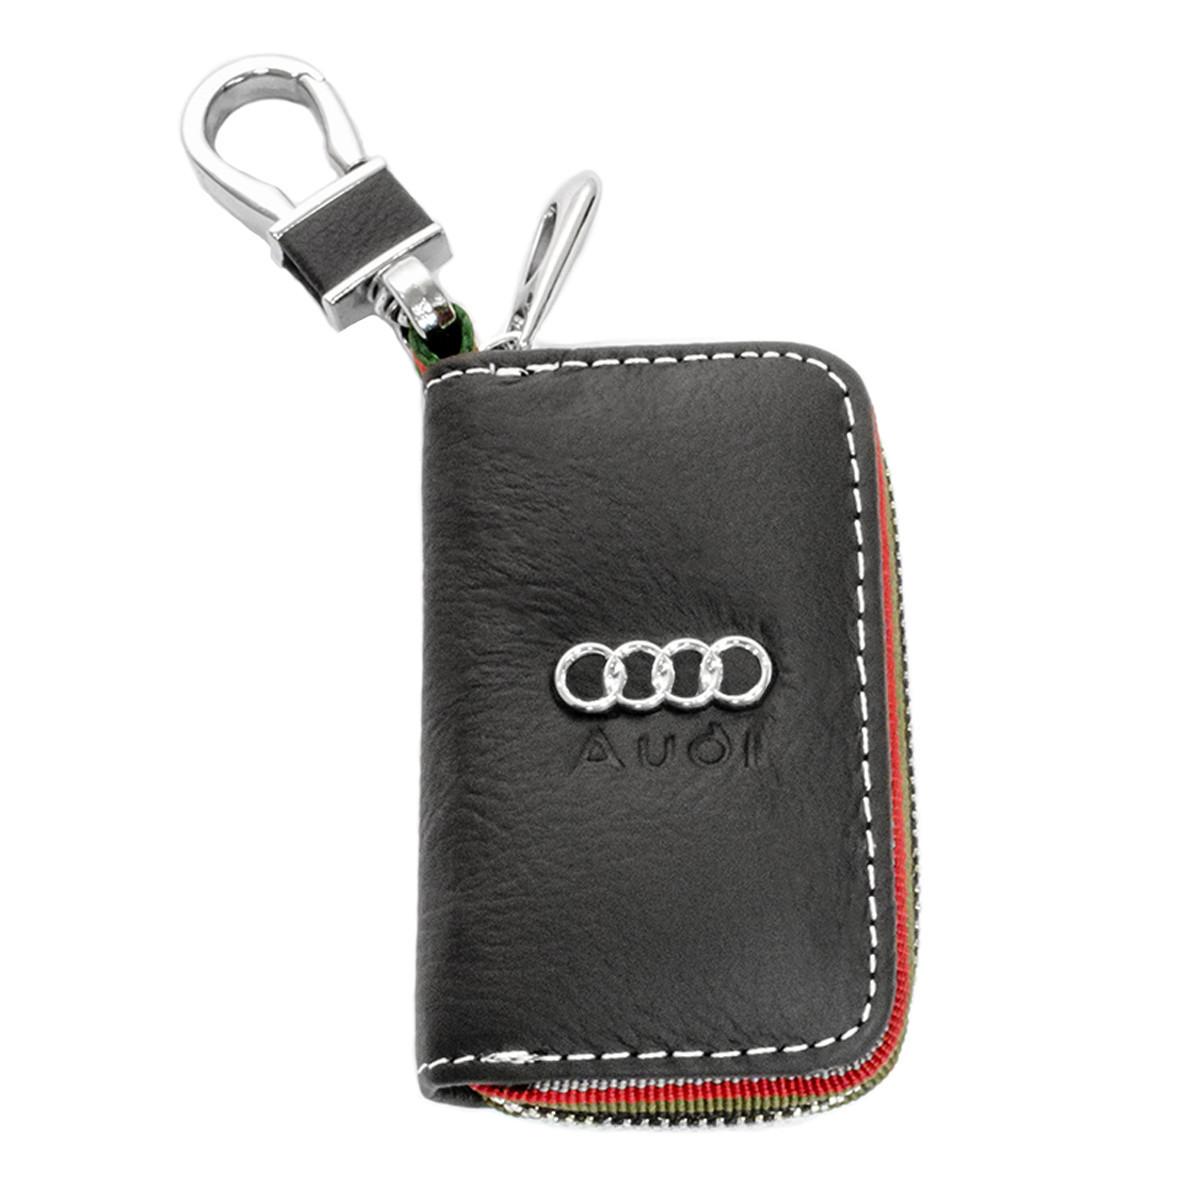 Ключница Carss с логотипом AUDI 01006 черная